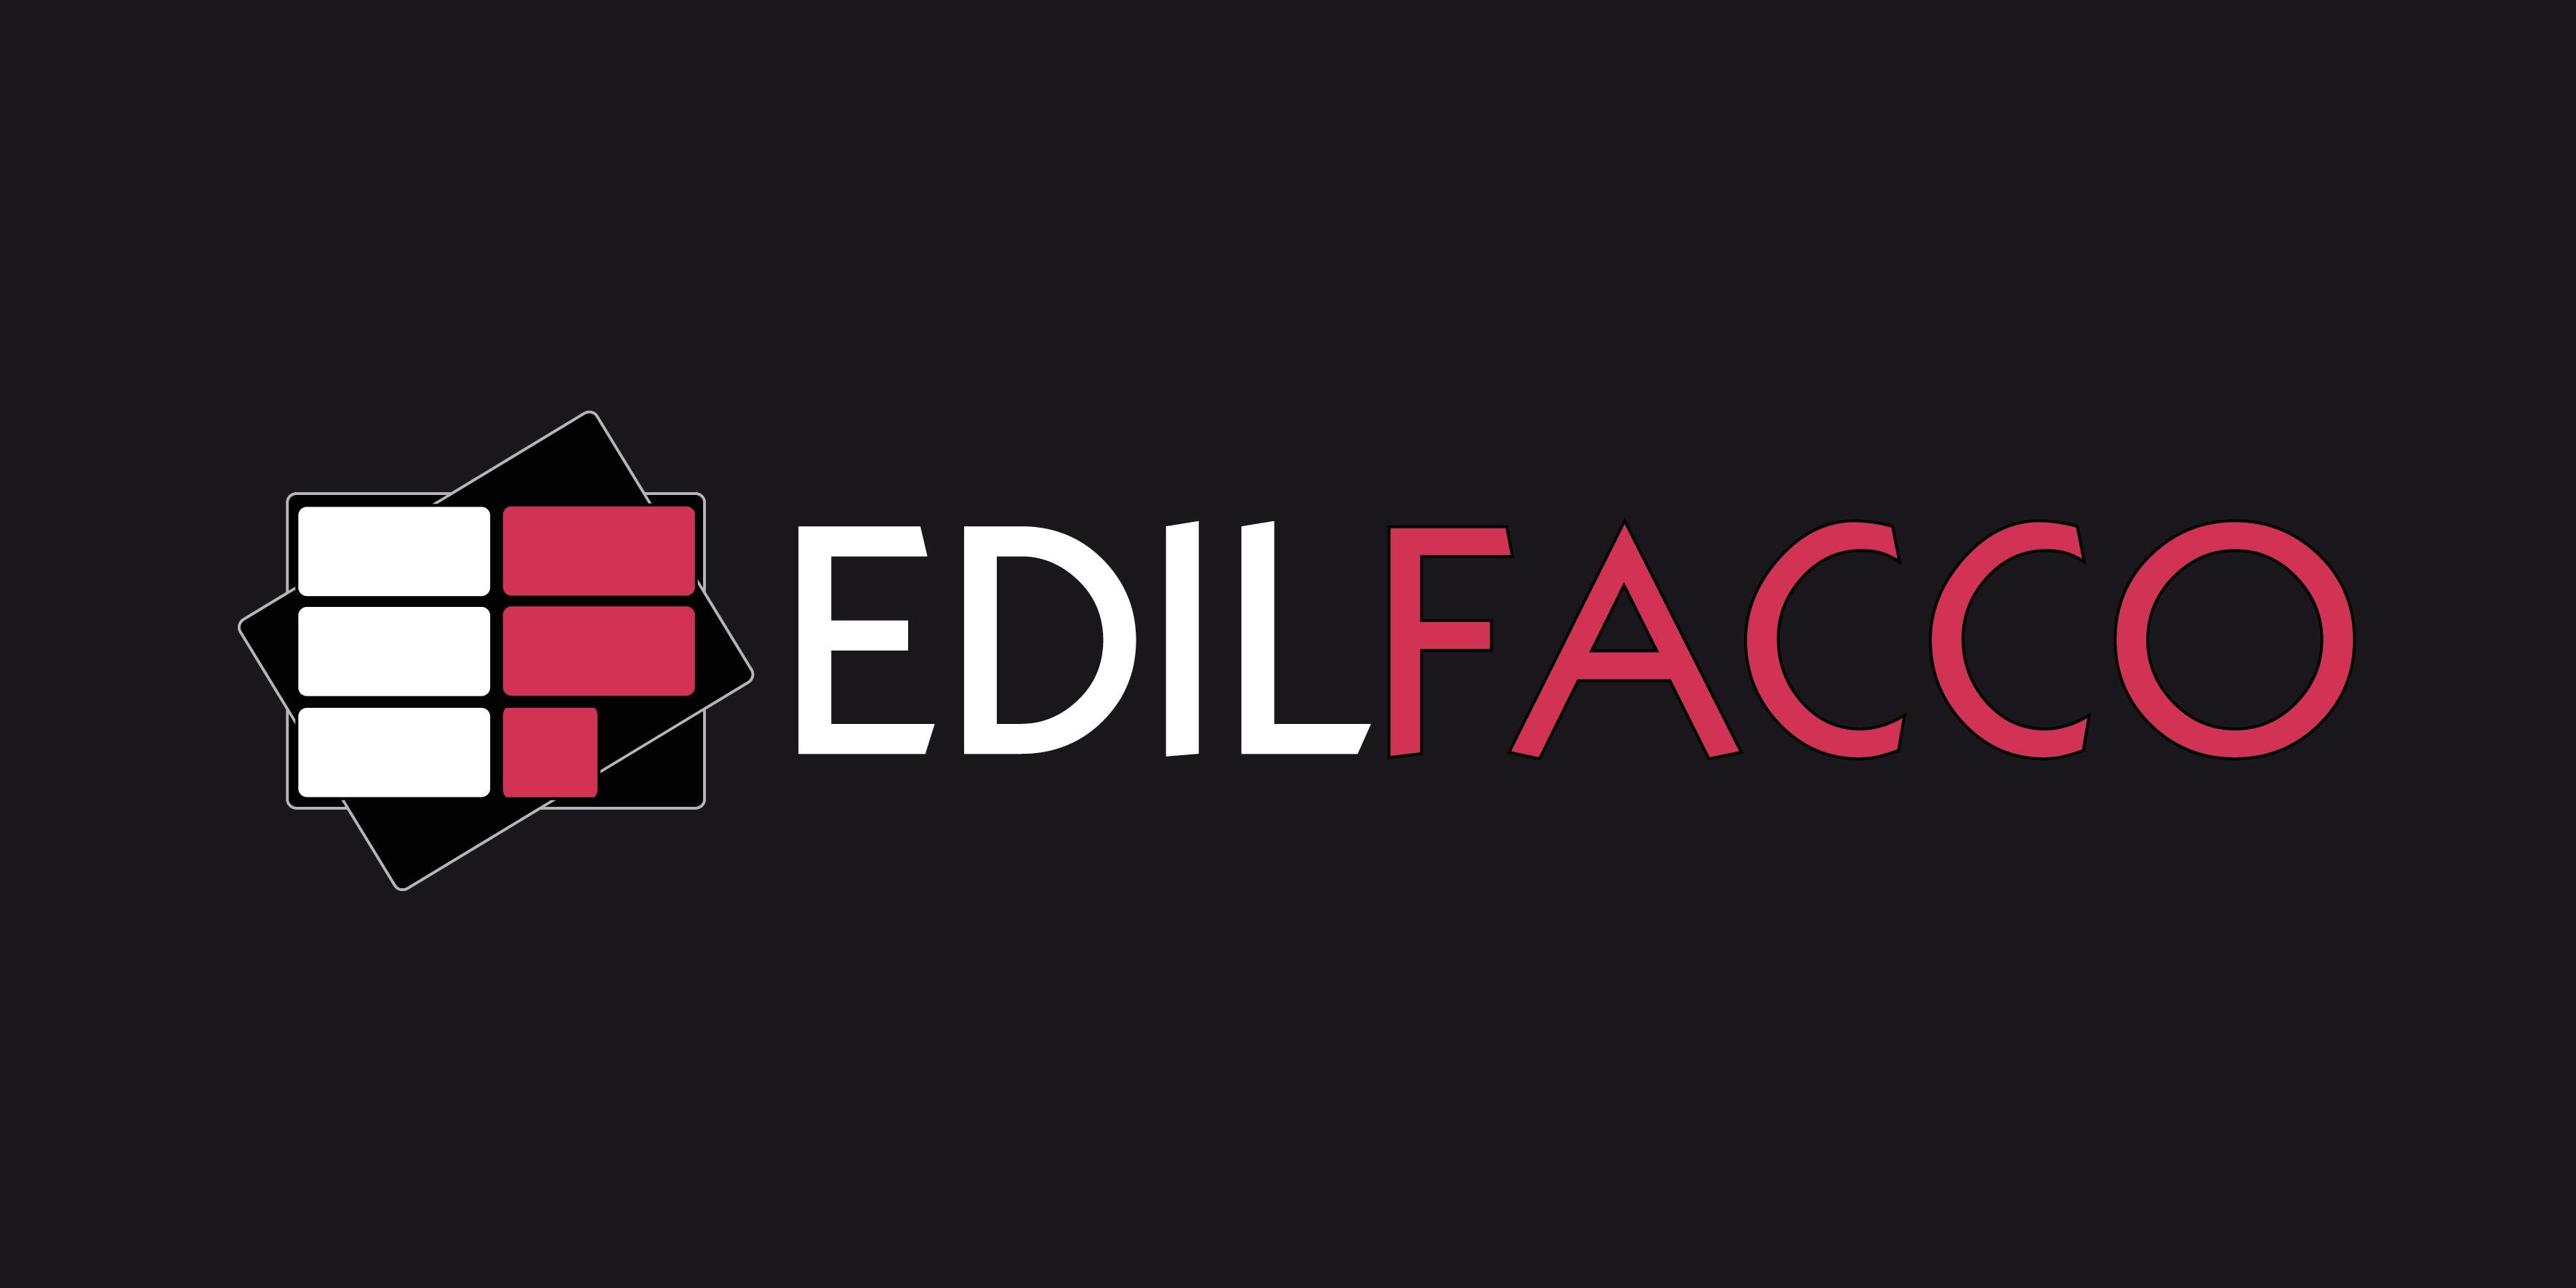 Edilfacco